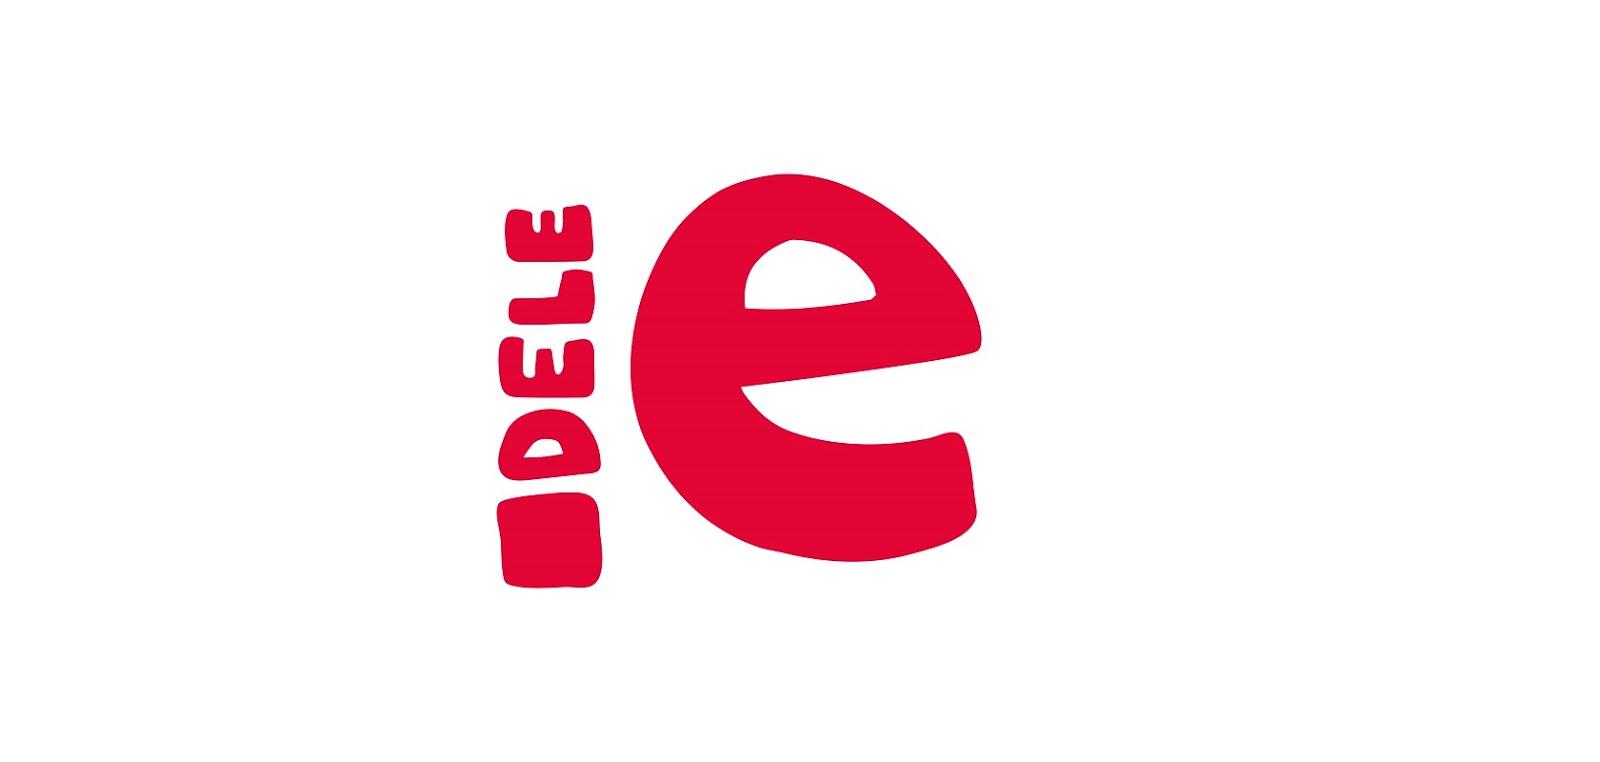 ESPAÑOL - Exámenes DELE